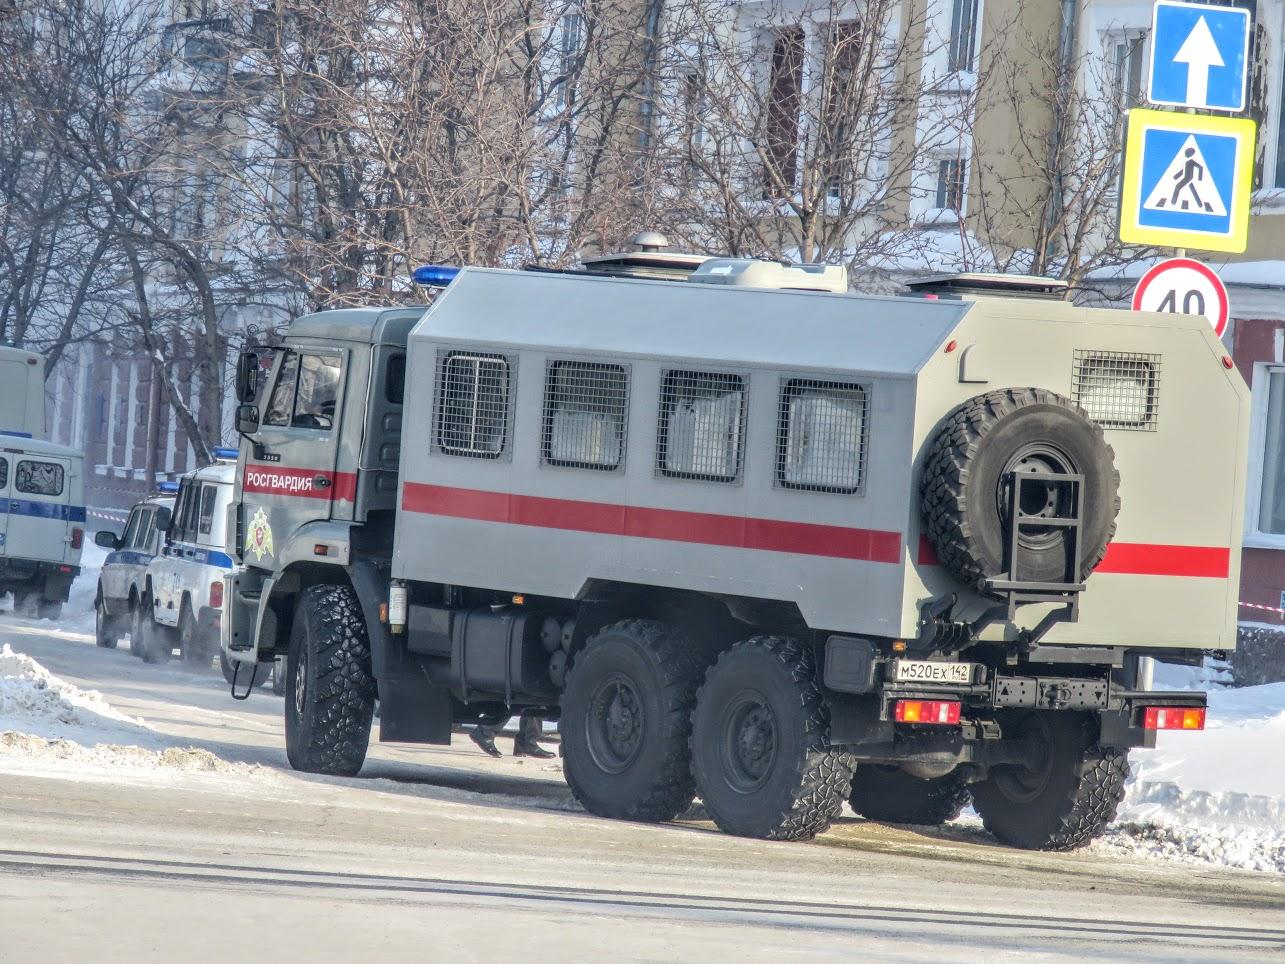 Транспорт не ходит - трамваи, троллейбусы. Полиция, люди, автозаки по городу IMG 1789